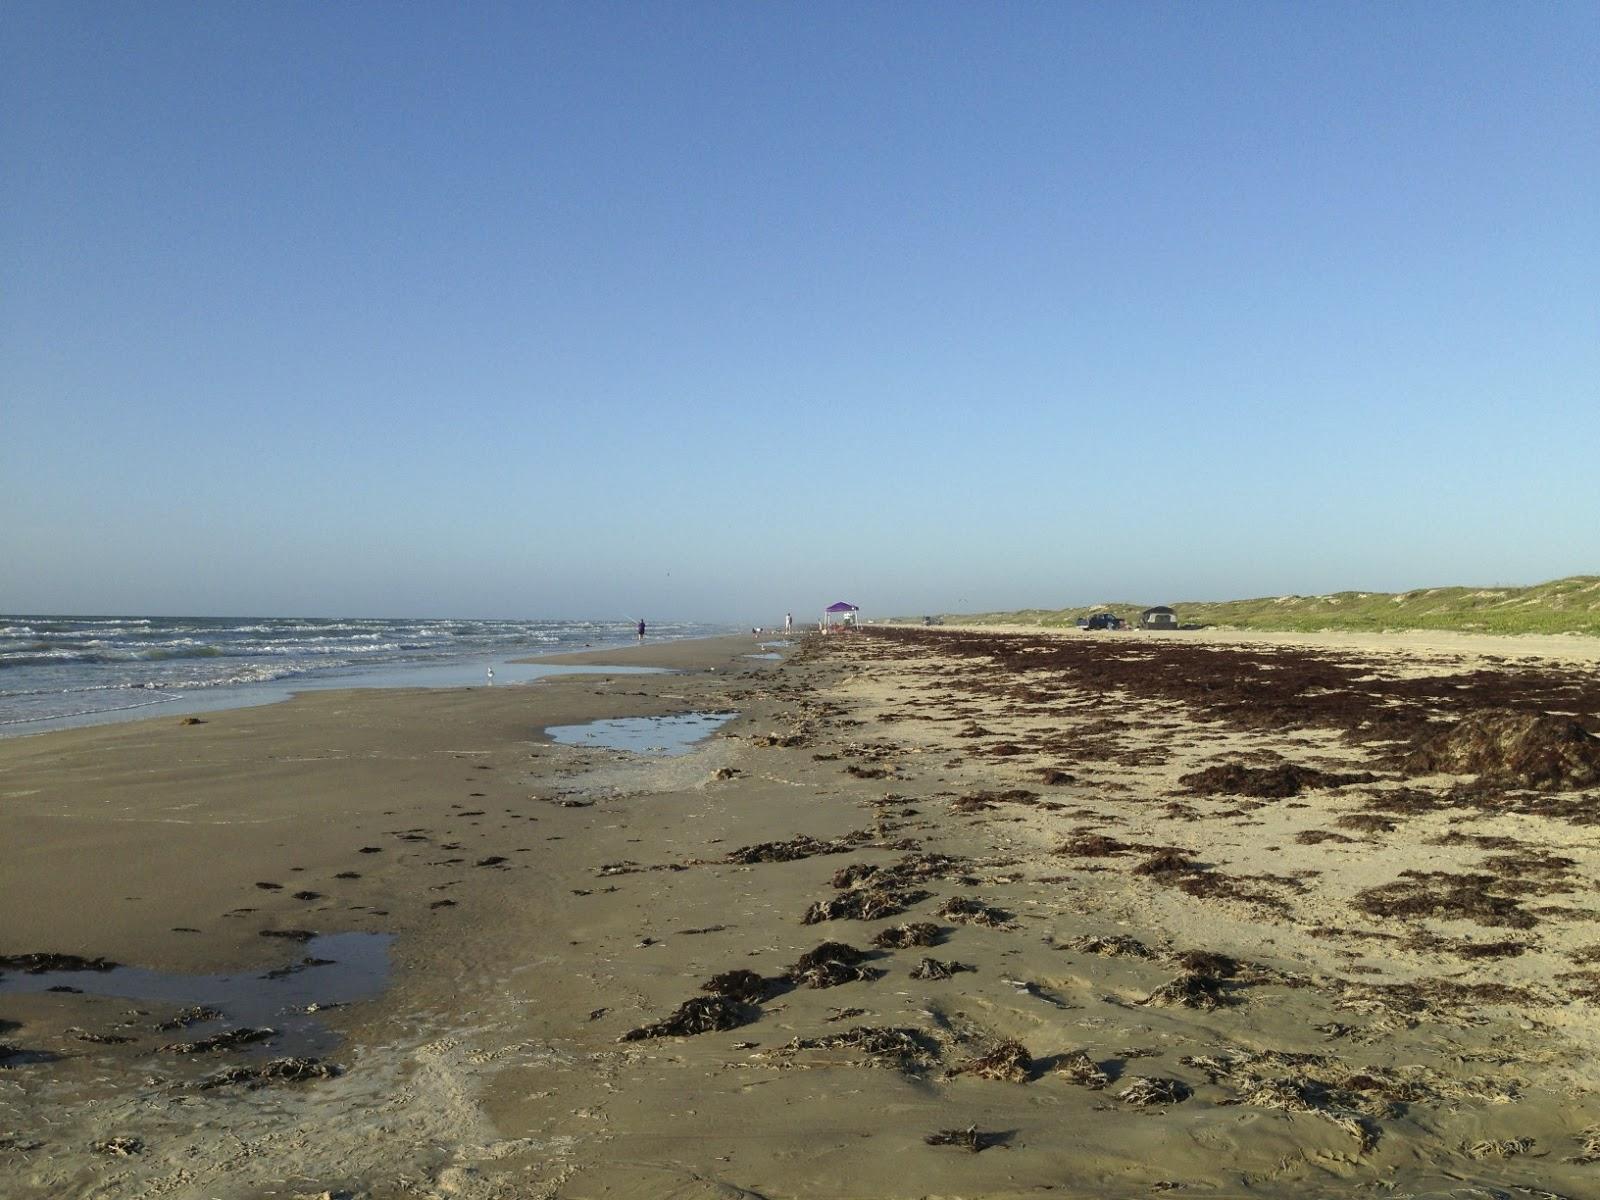 Oneshot Padre Island National Seashore